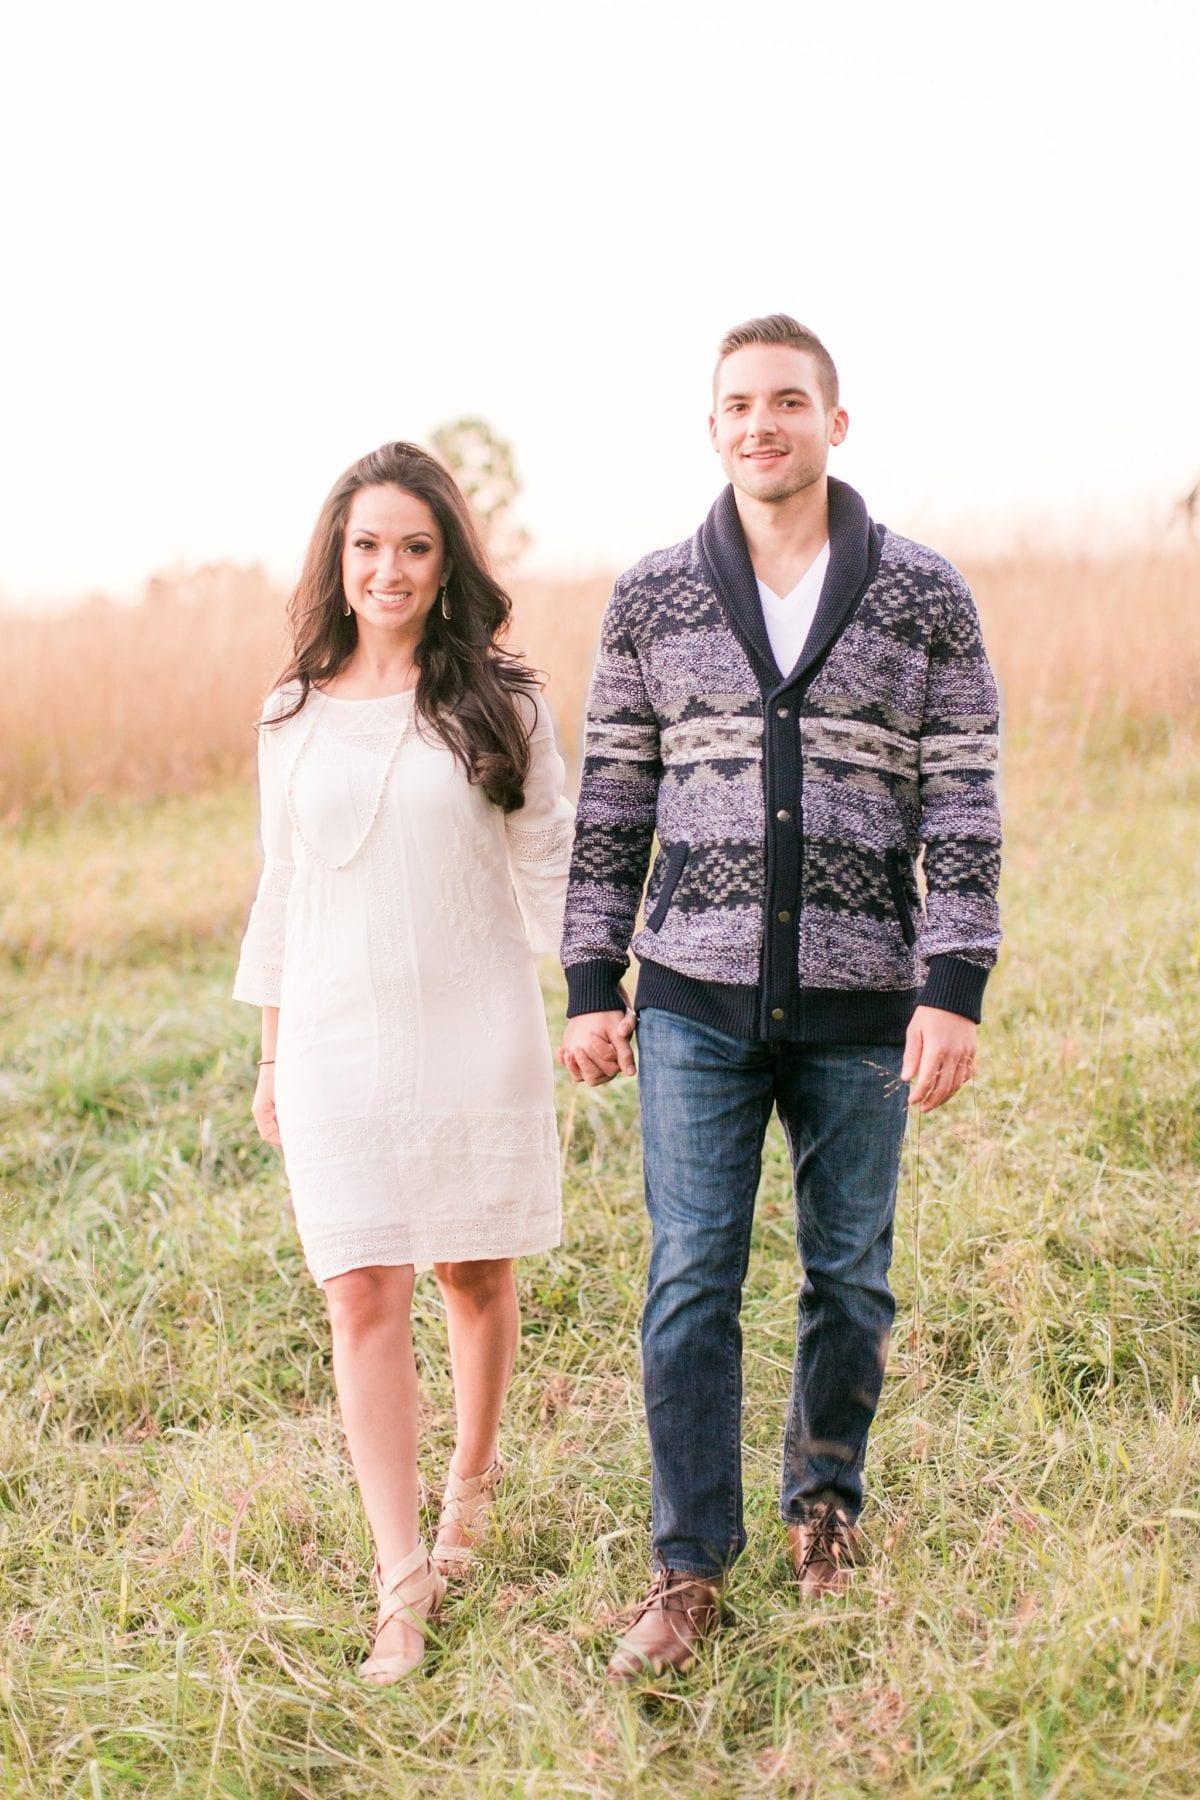 Manassas Battlefield Portraits Virginia Wedding Photographer Megan Kelsey Photography Lianne & Chris-303.jpg